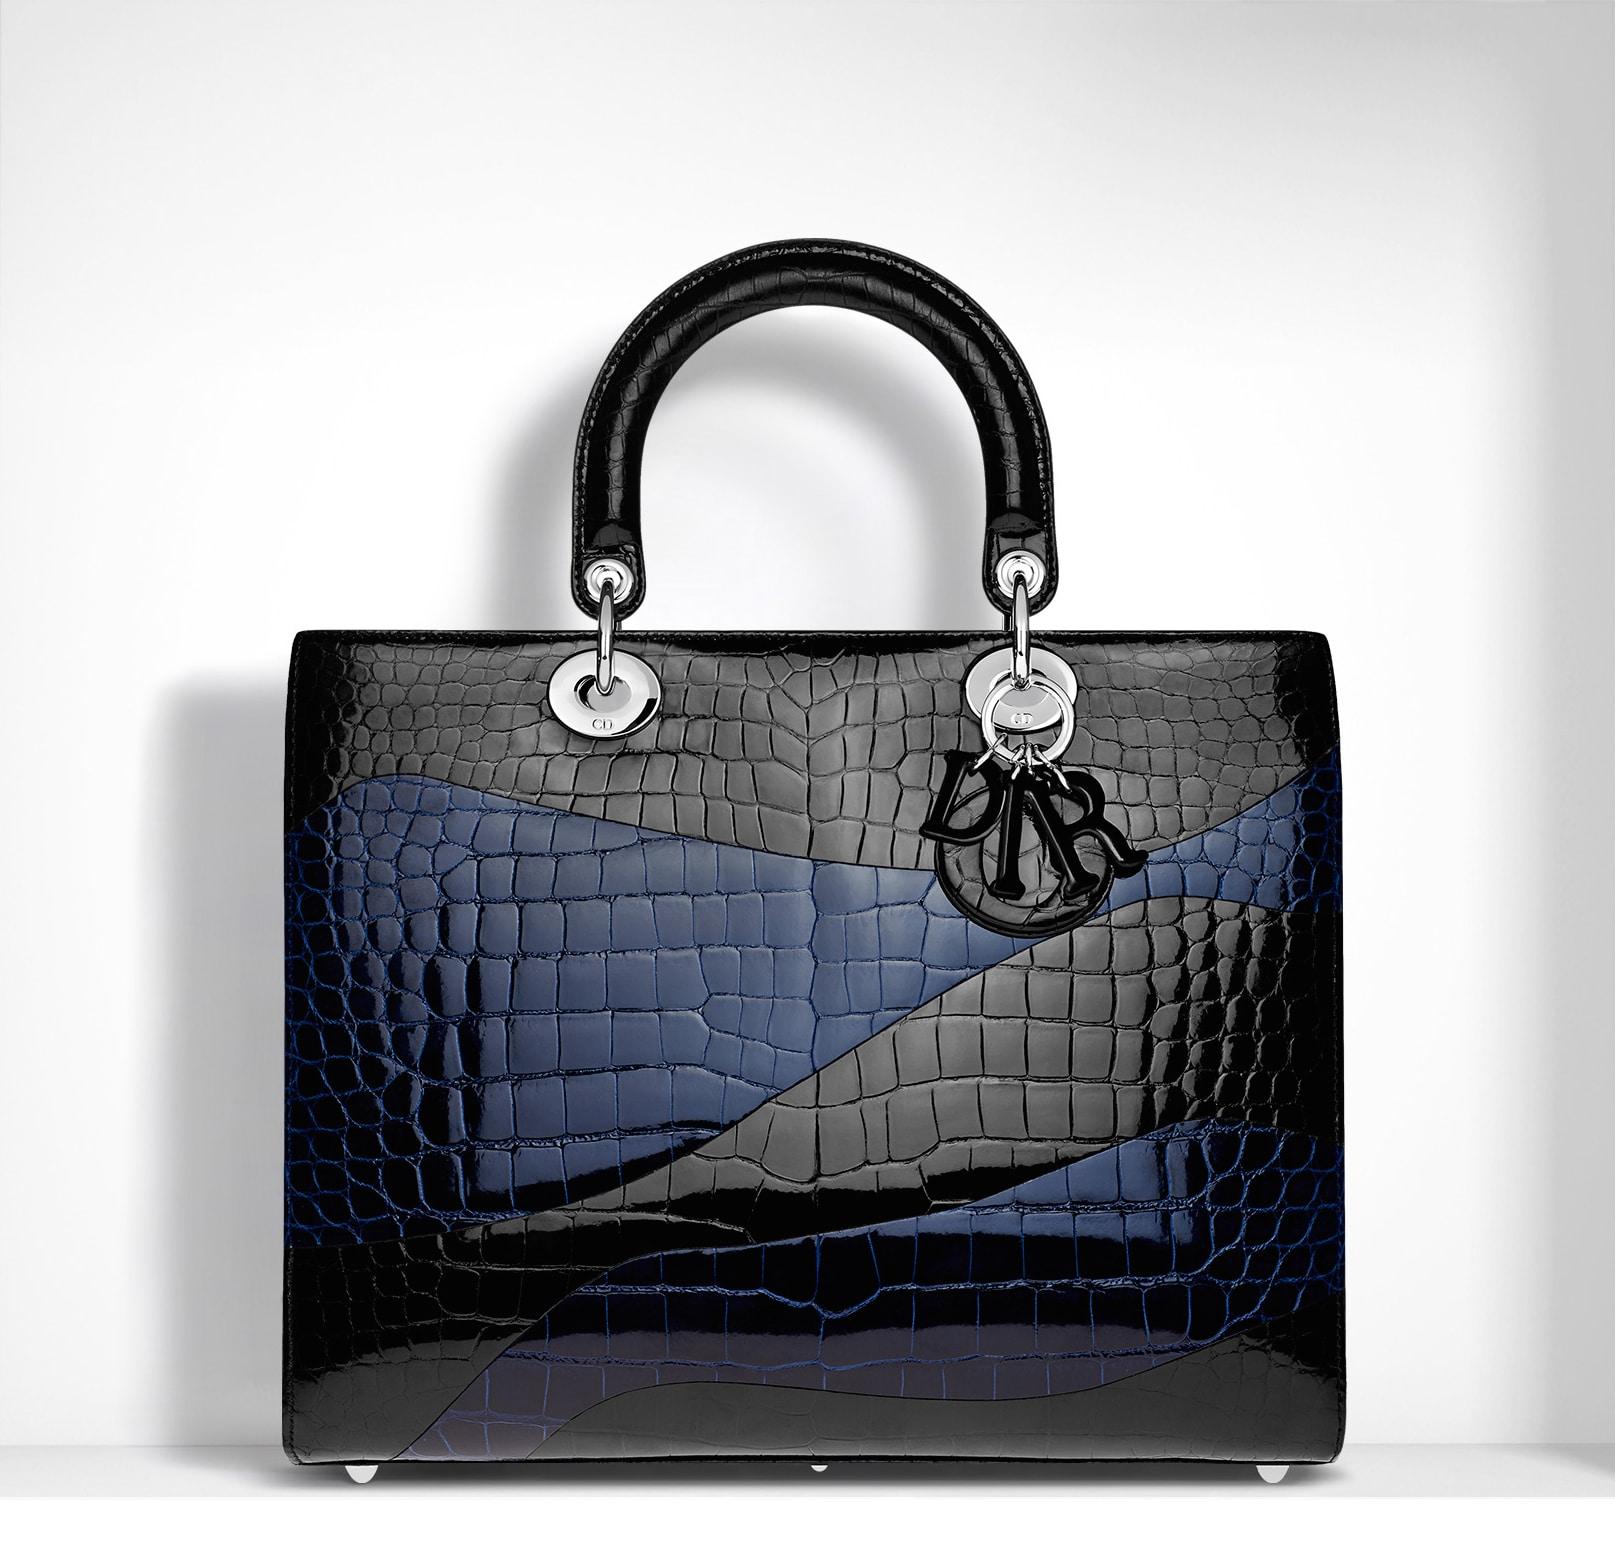 45cc1b2bac Dior Black/Blue Marquetry with Zebra Prints Lady Dior Large Bag